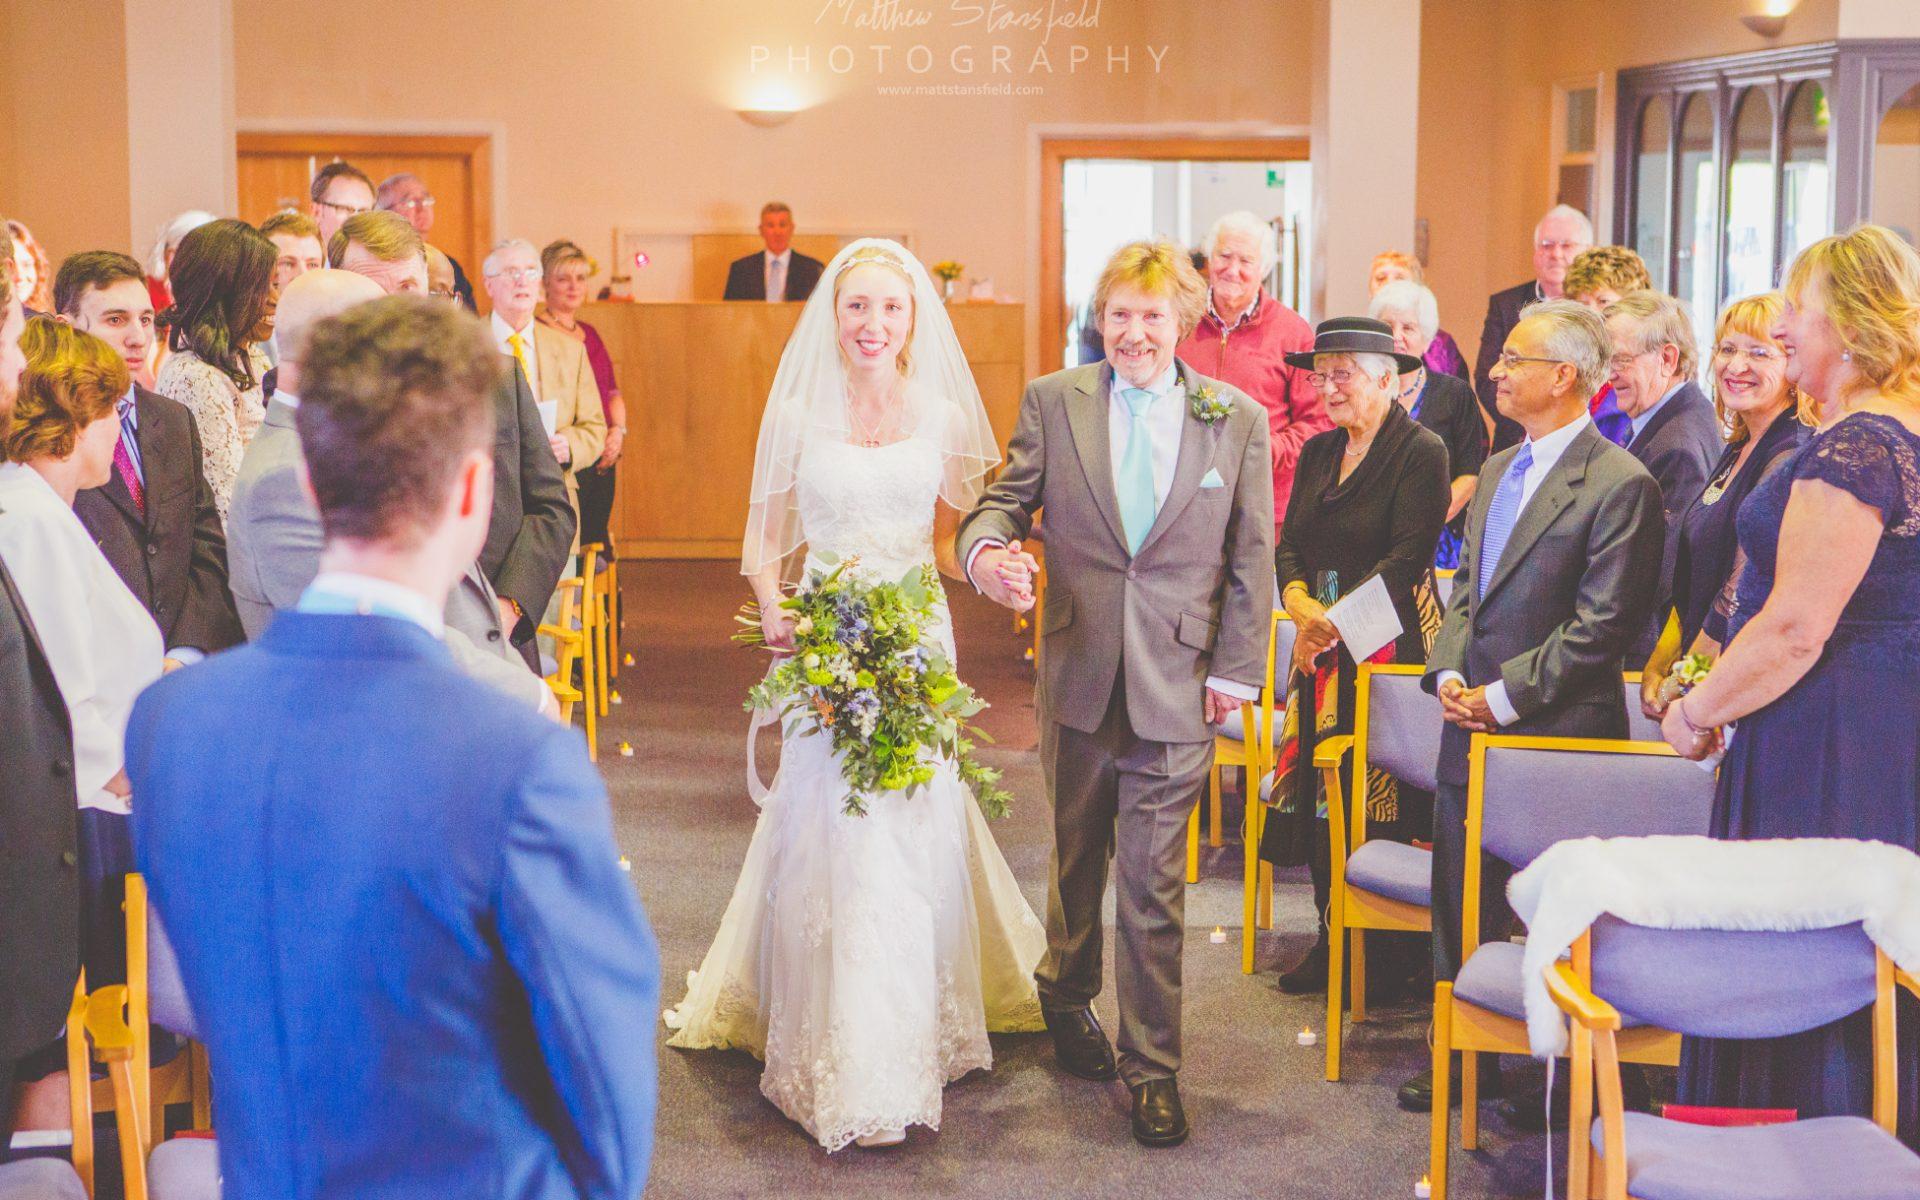 Charlotte & Richard - South Devon Wedding Photography Plymouth Methodist Central Hall